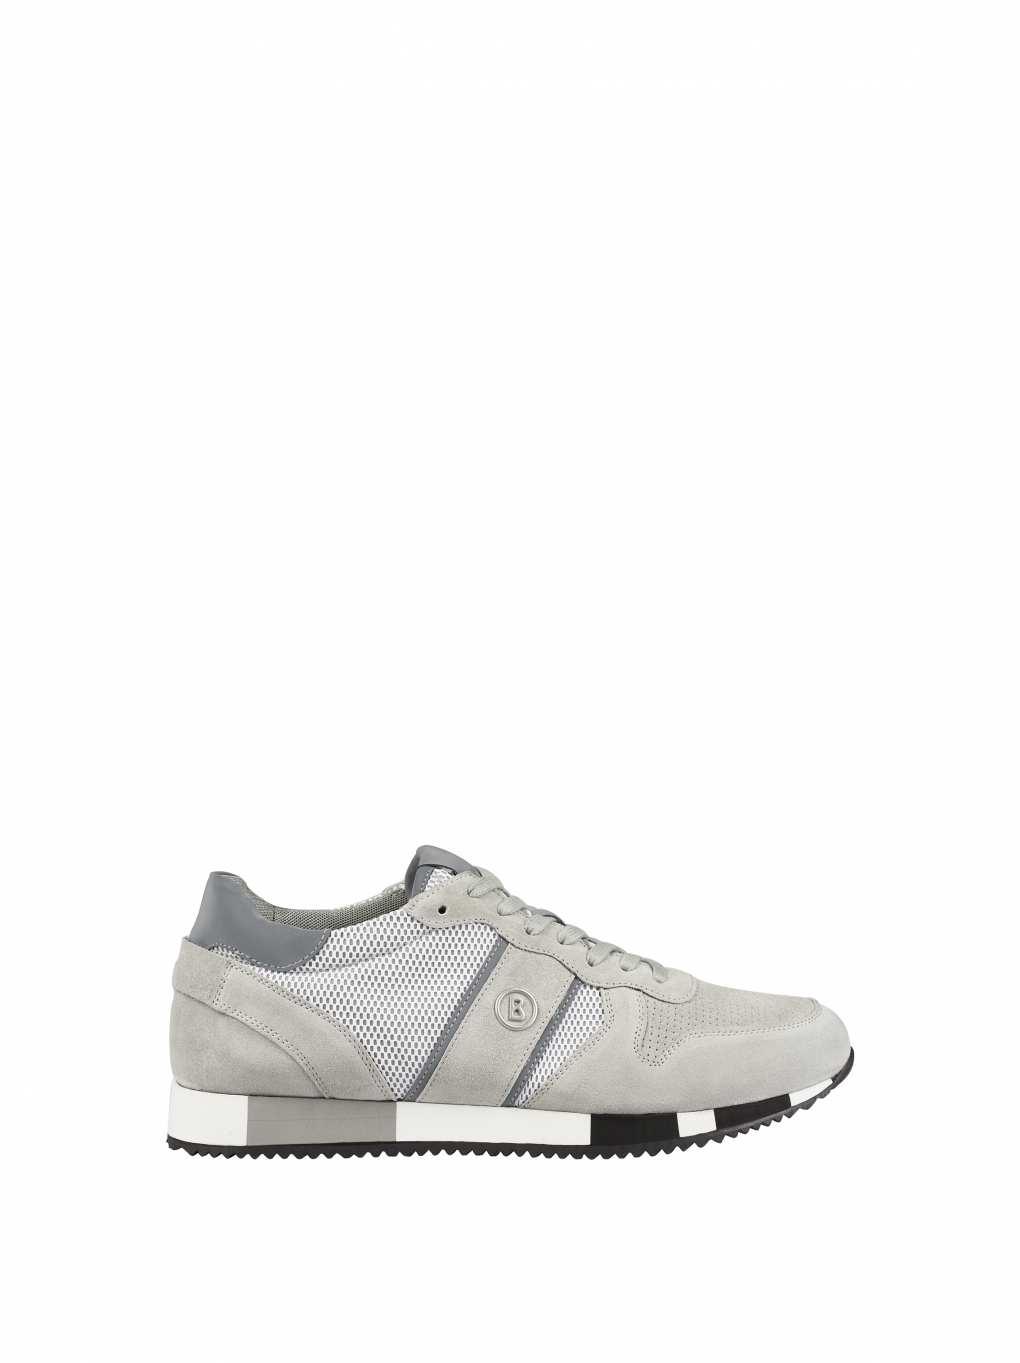 Кроссовки ROME 5 B Bogner Shoes man